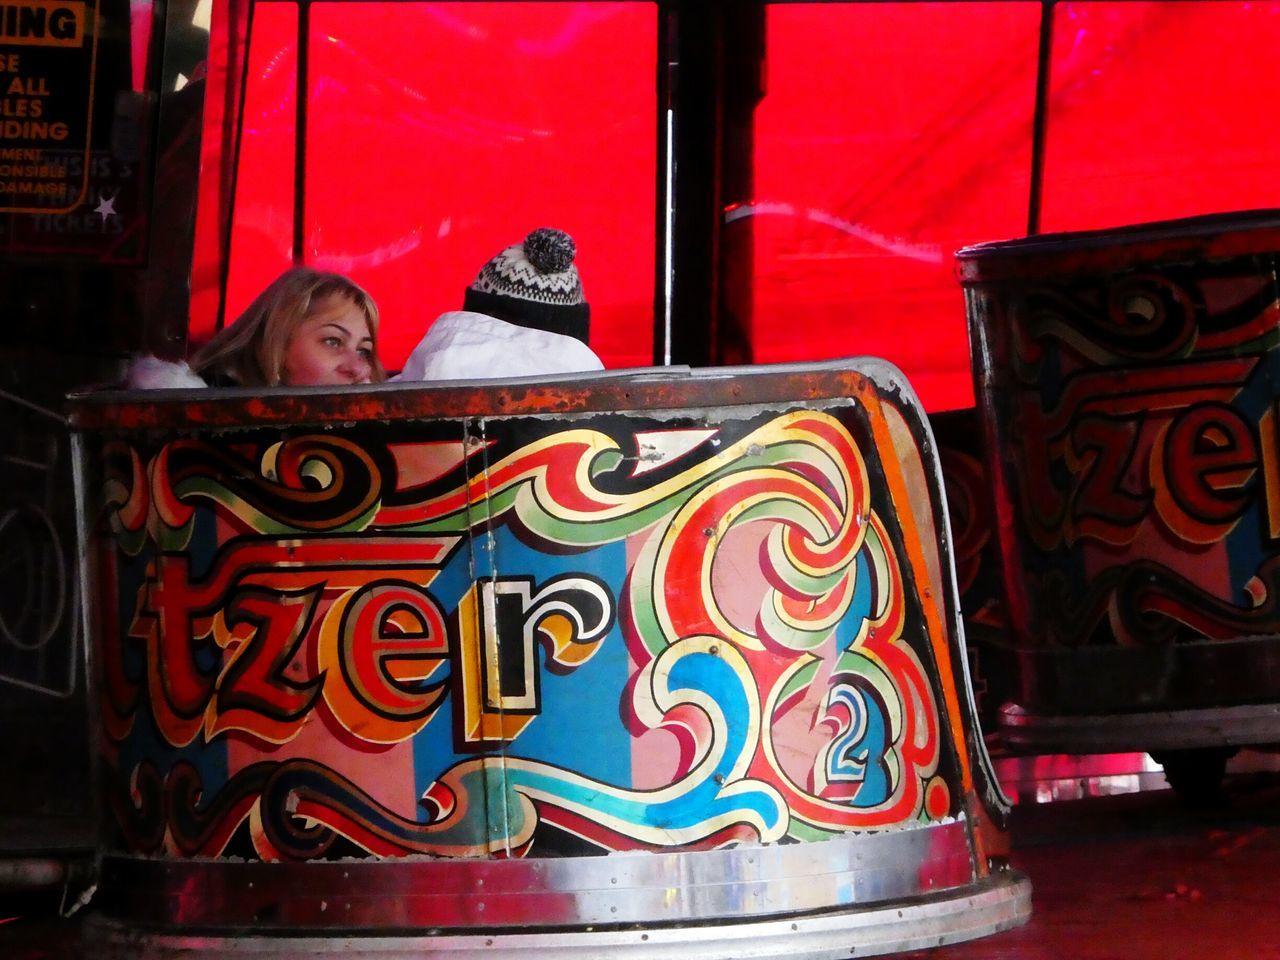 Fairground Ride Fairground Waltzer Colourful Artistic Bright Colours People Conversation One Woman Tourism Fun